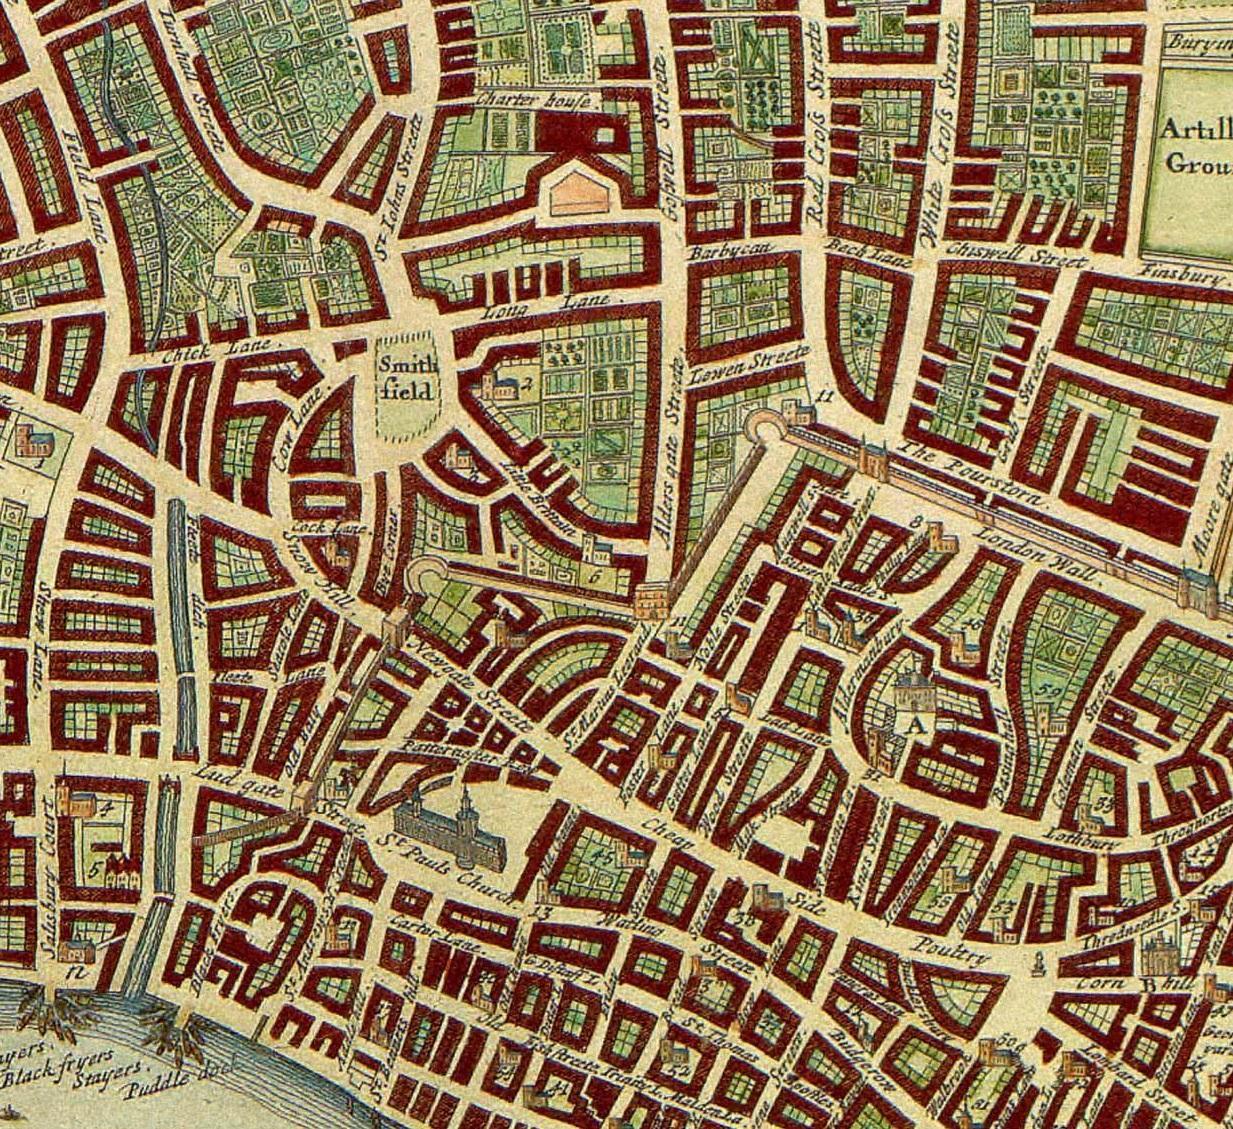 London 1708: a Walk into Library History